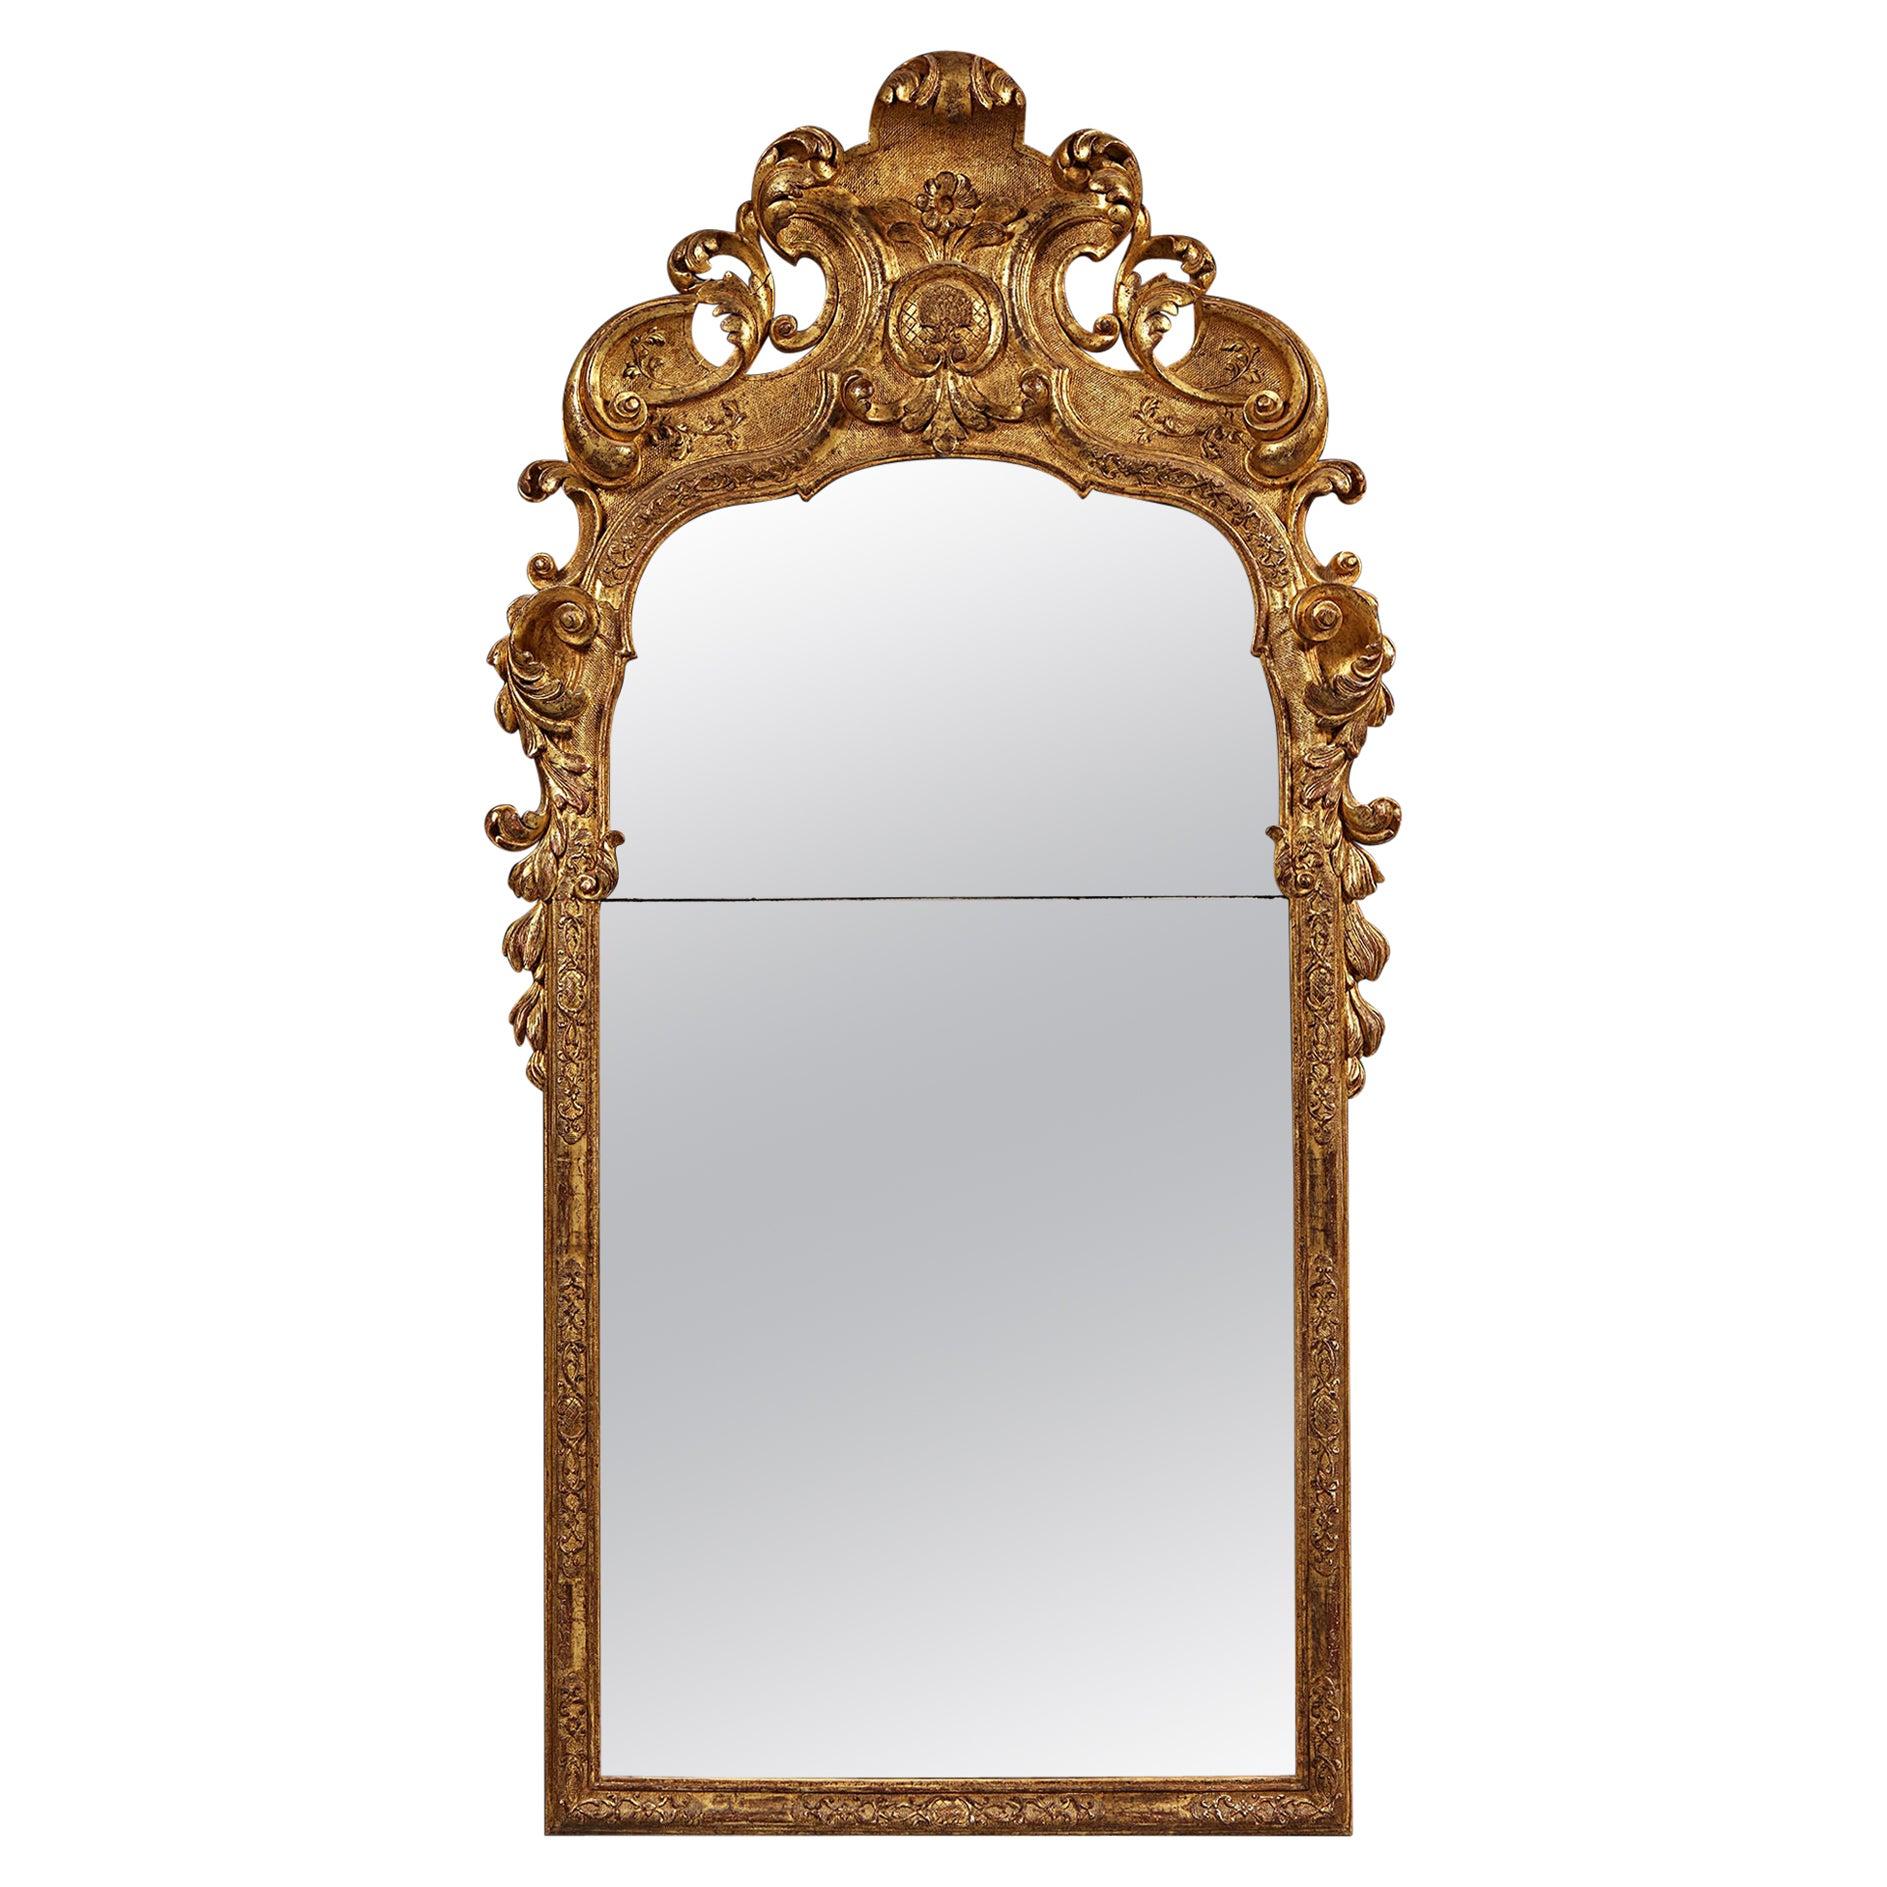 Early 18th Century German Giltwood Pier Mirror, Louis XIV Baroque Period